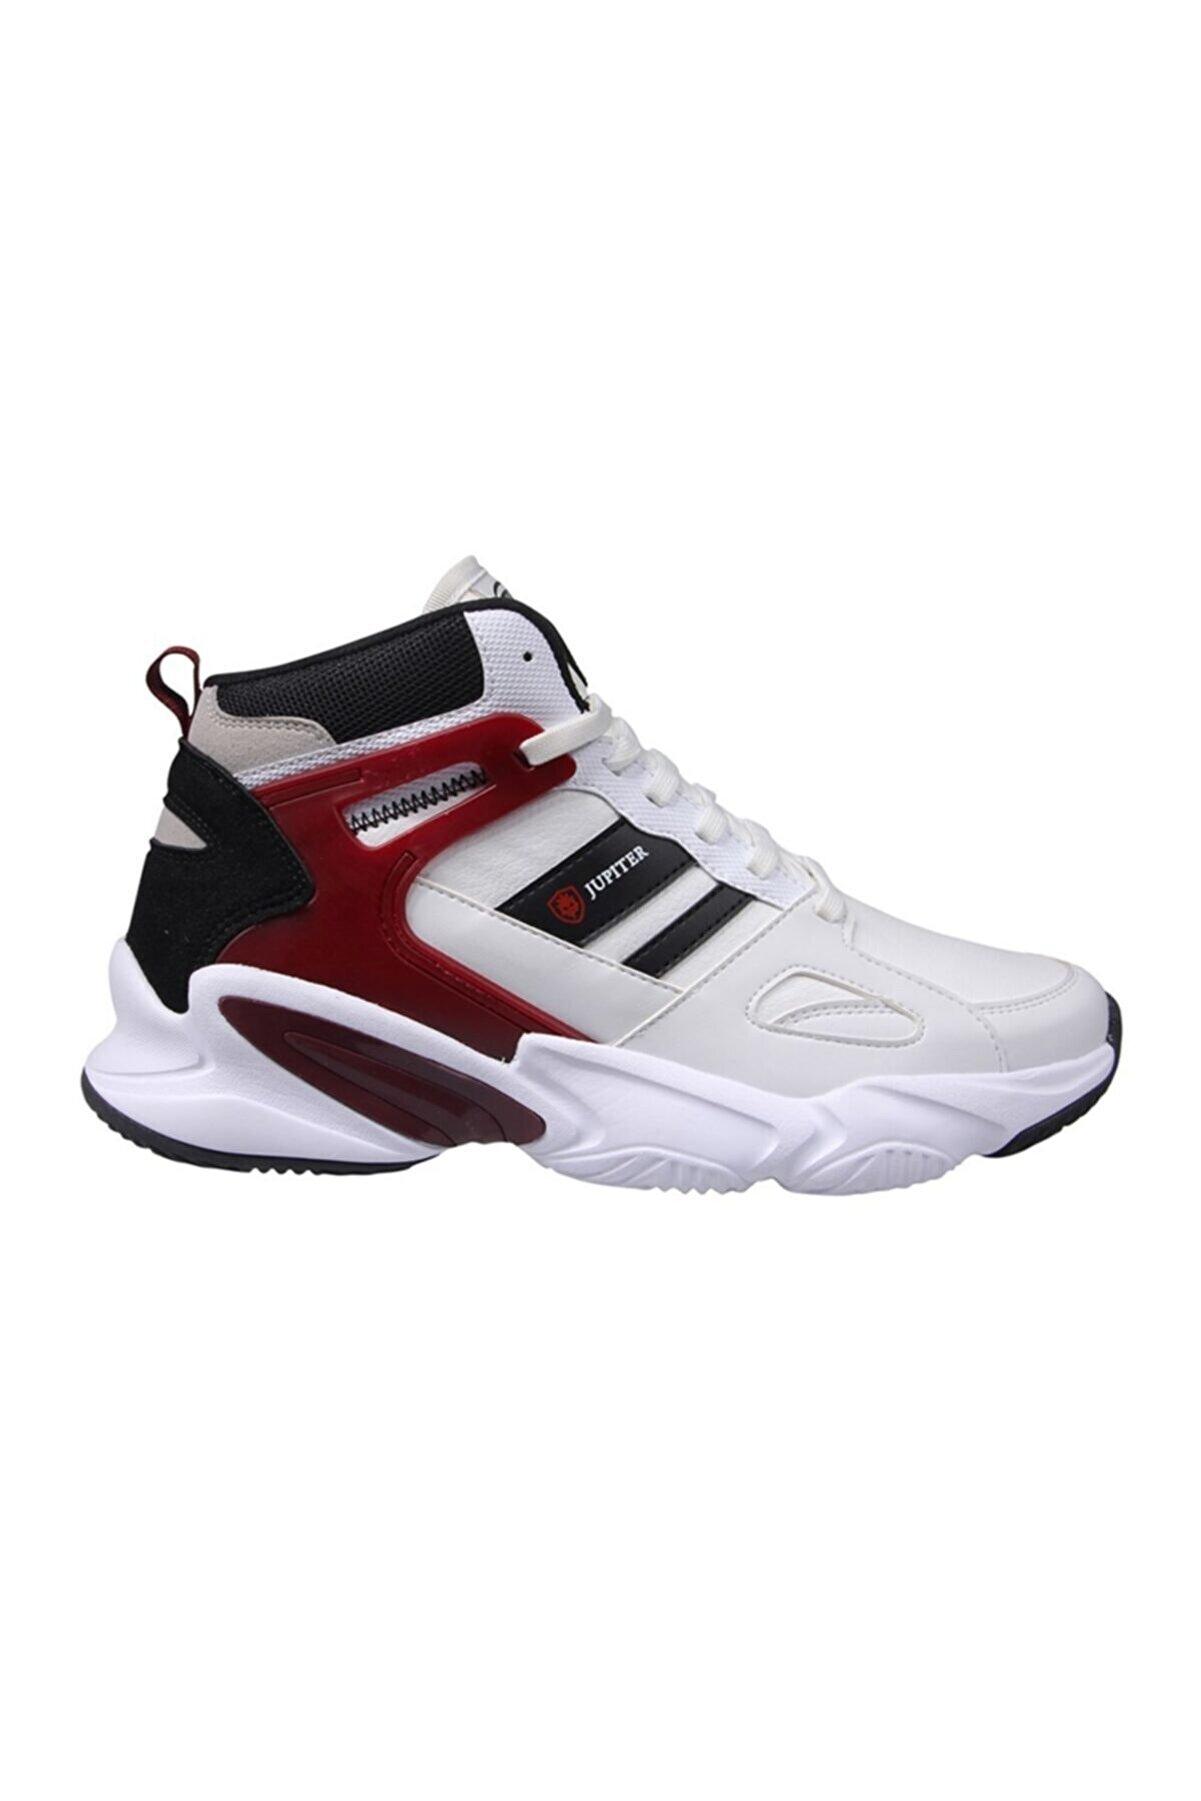 MP 202-1401 Basket Beyaz Bordo Erkek Sneakers